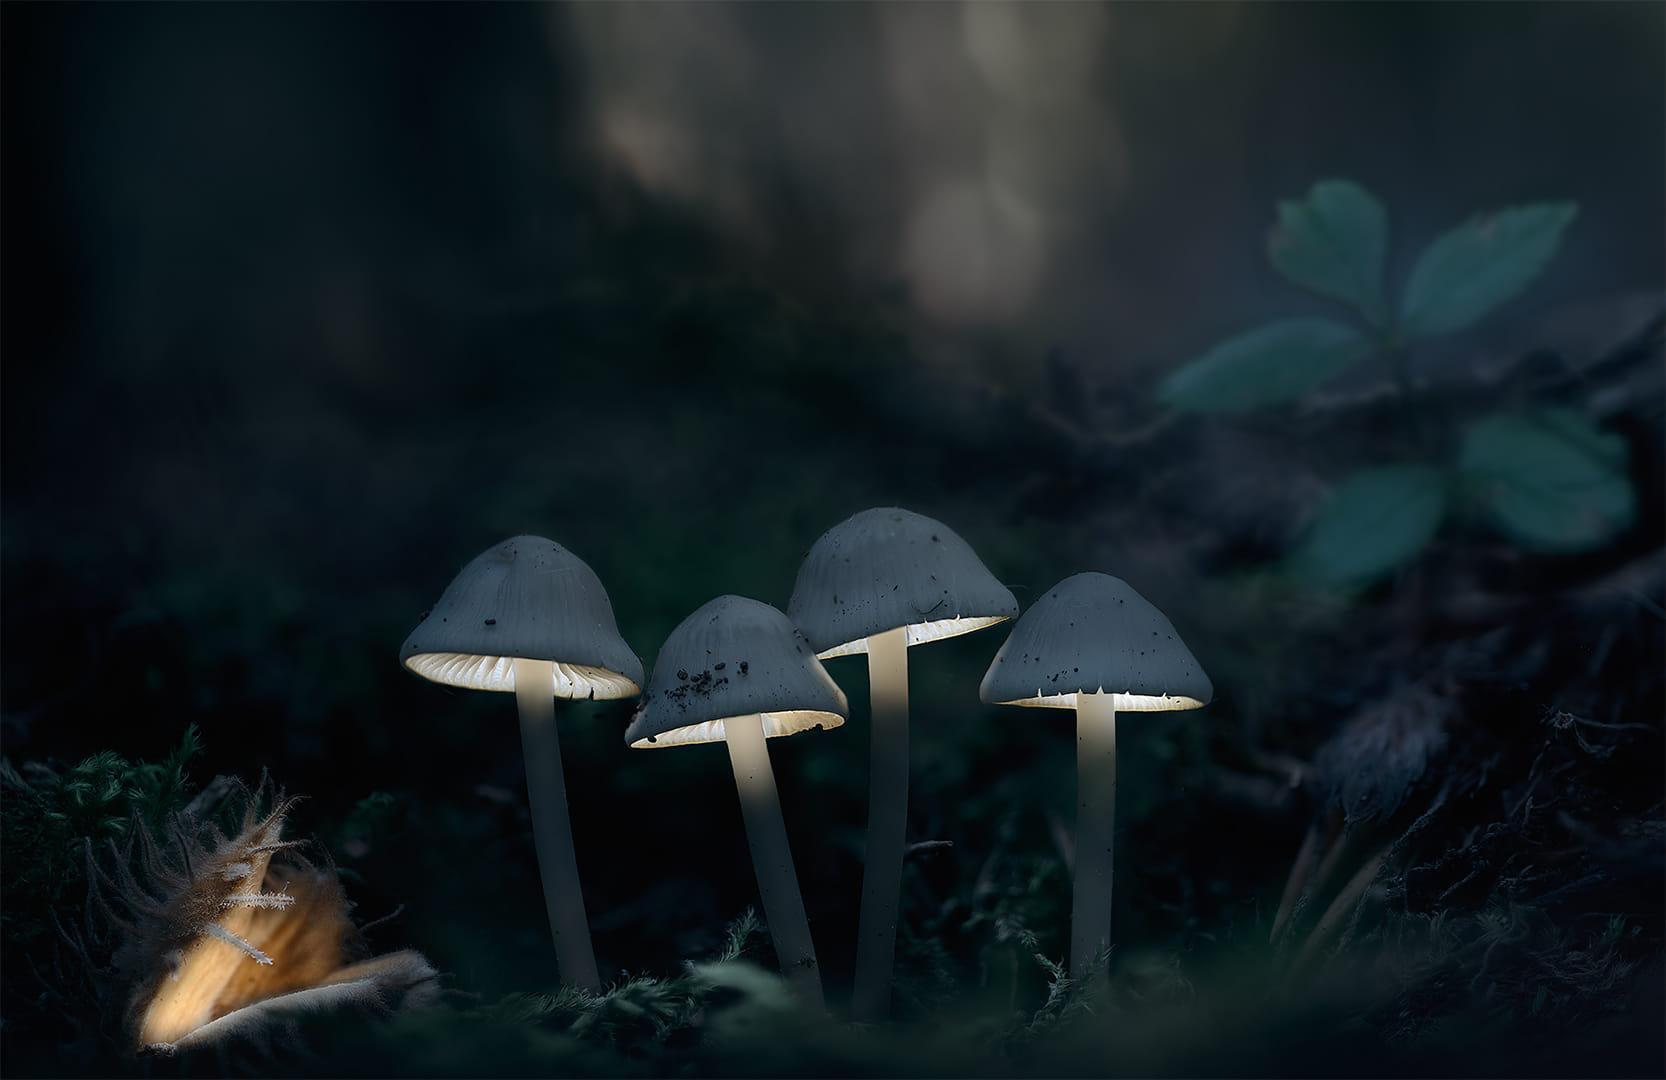 Misteris del Bosc